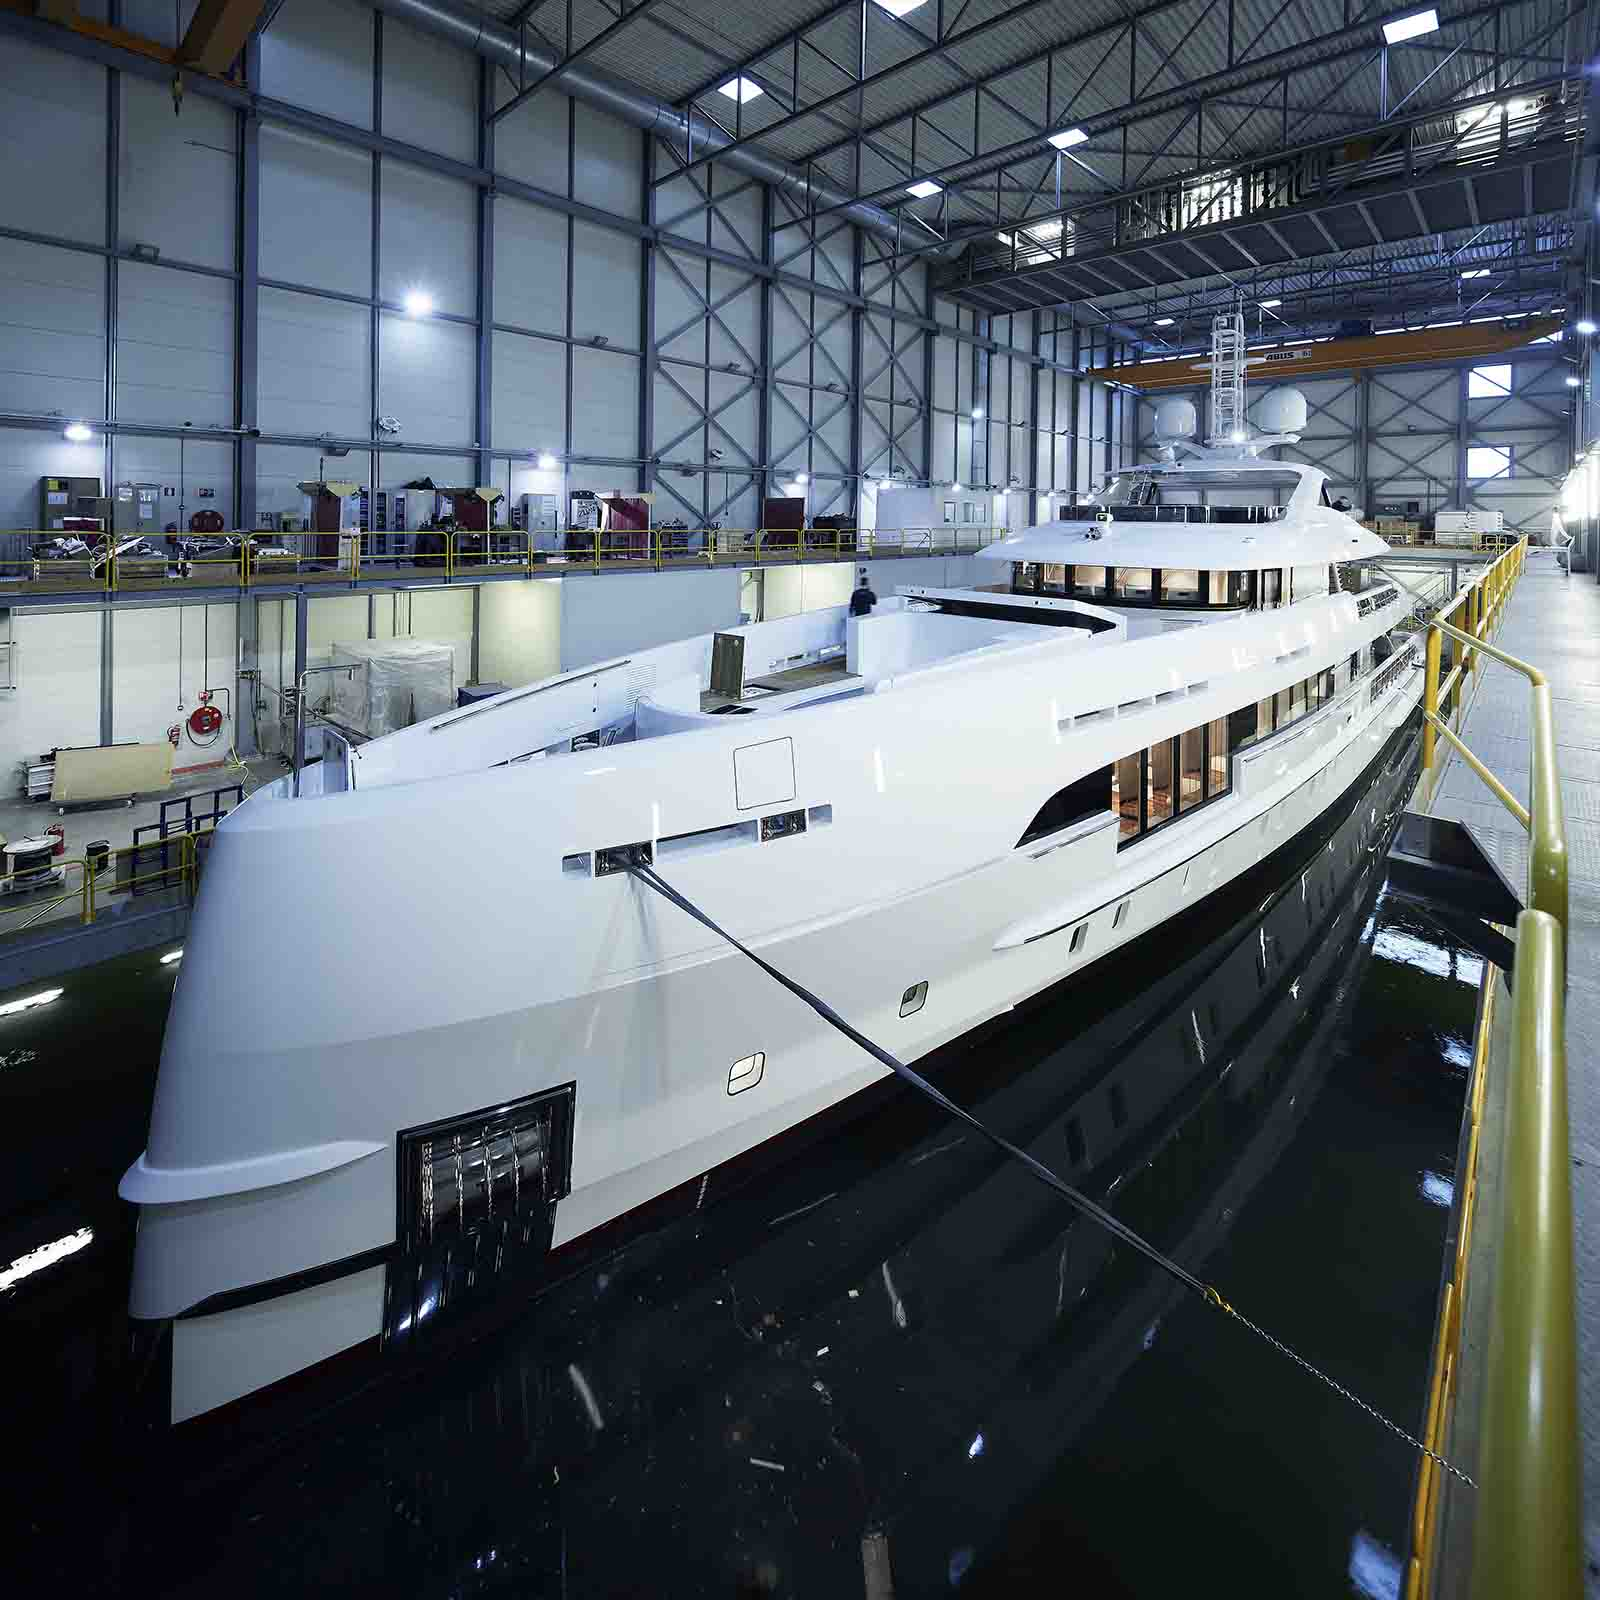 Heesen superiate híbrido - boat shopping